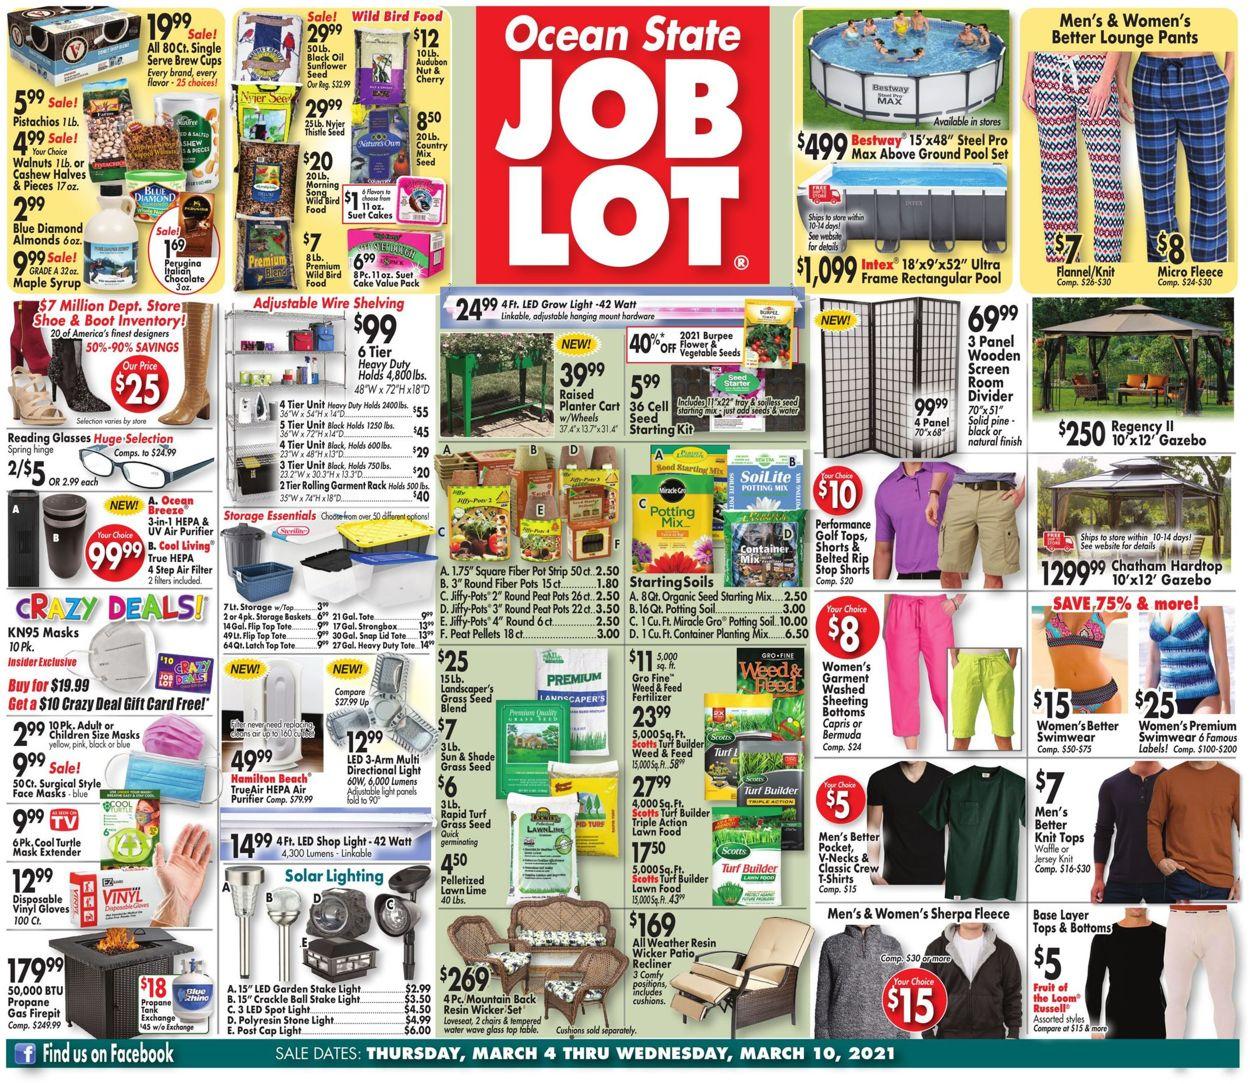 Ocean State Job Lot Weekly Ad Circular - valid 03/04-03/10/2021